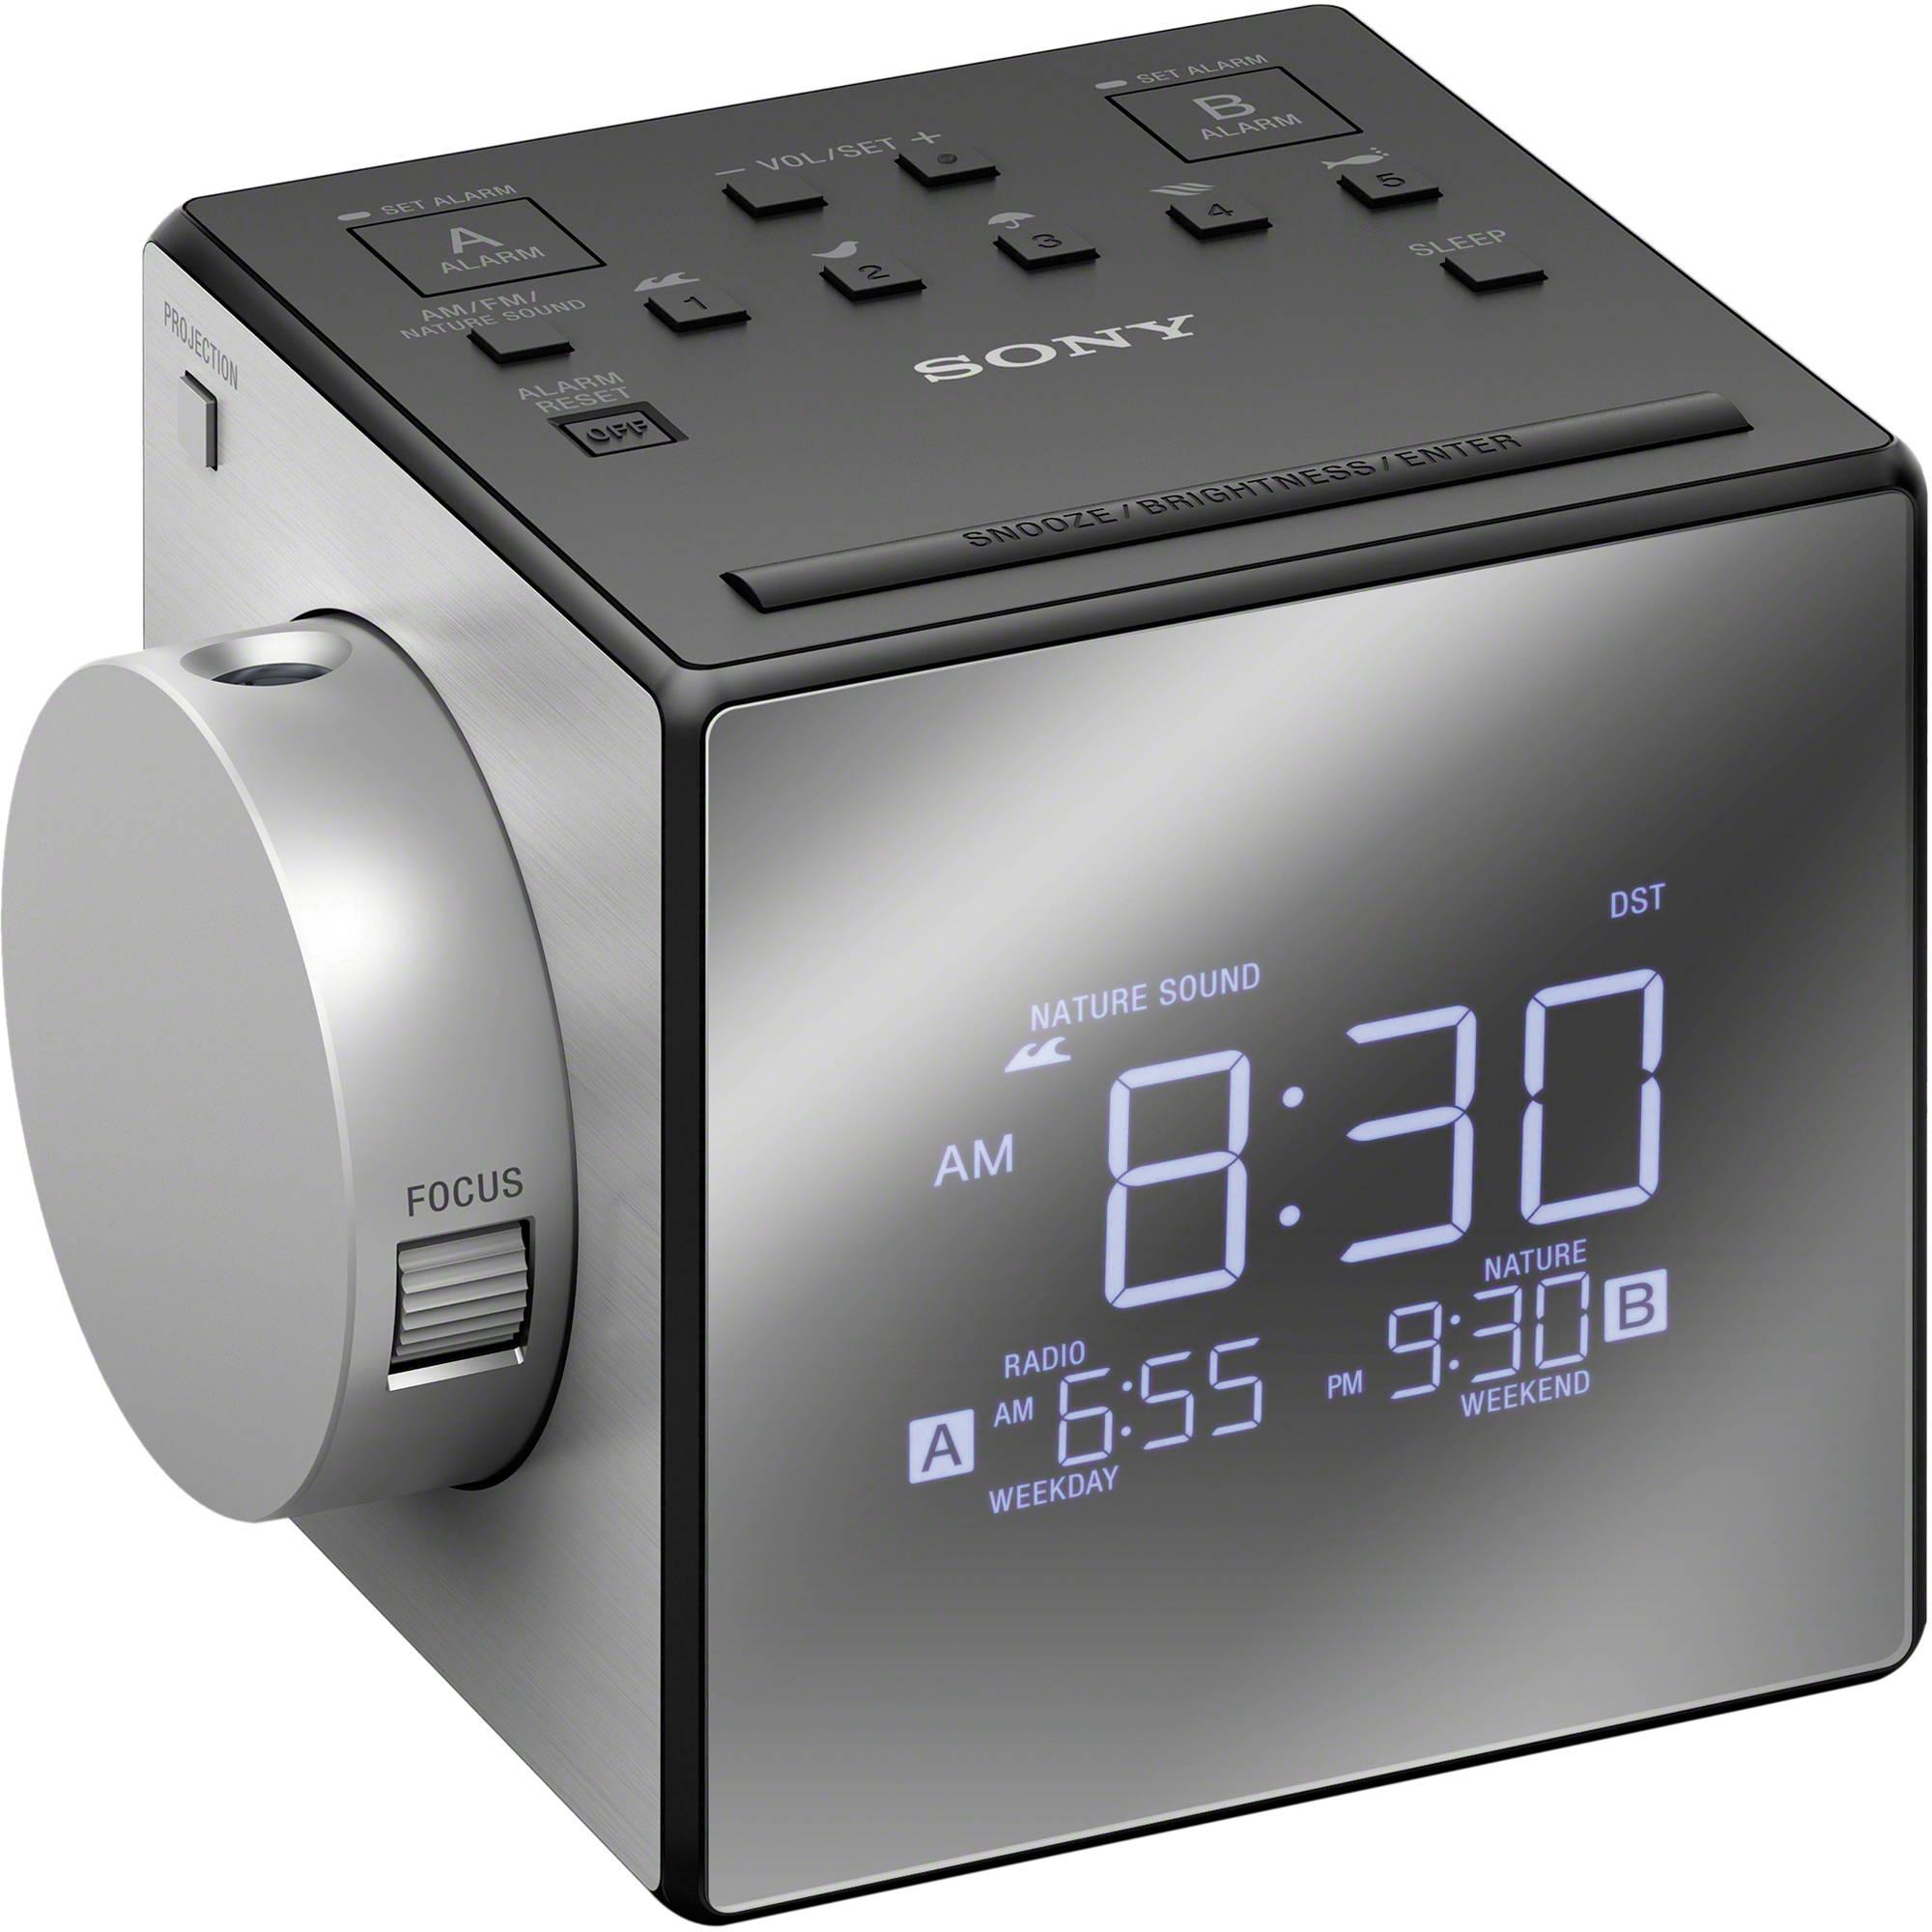 Sony Icf C1pj Alarm Clock Radio With Time Projecti Icfc1pj B H